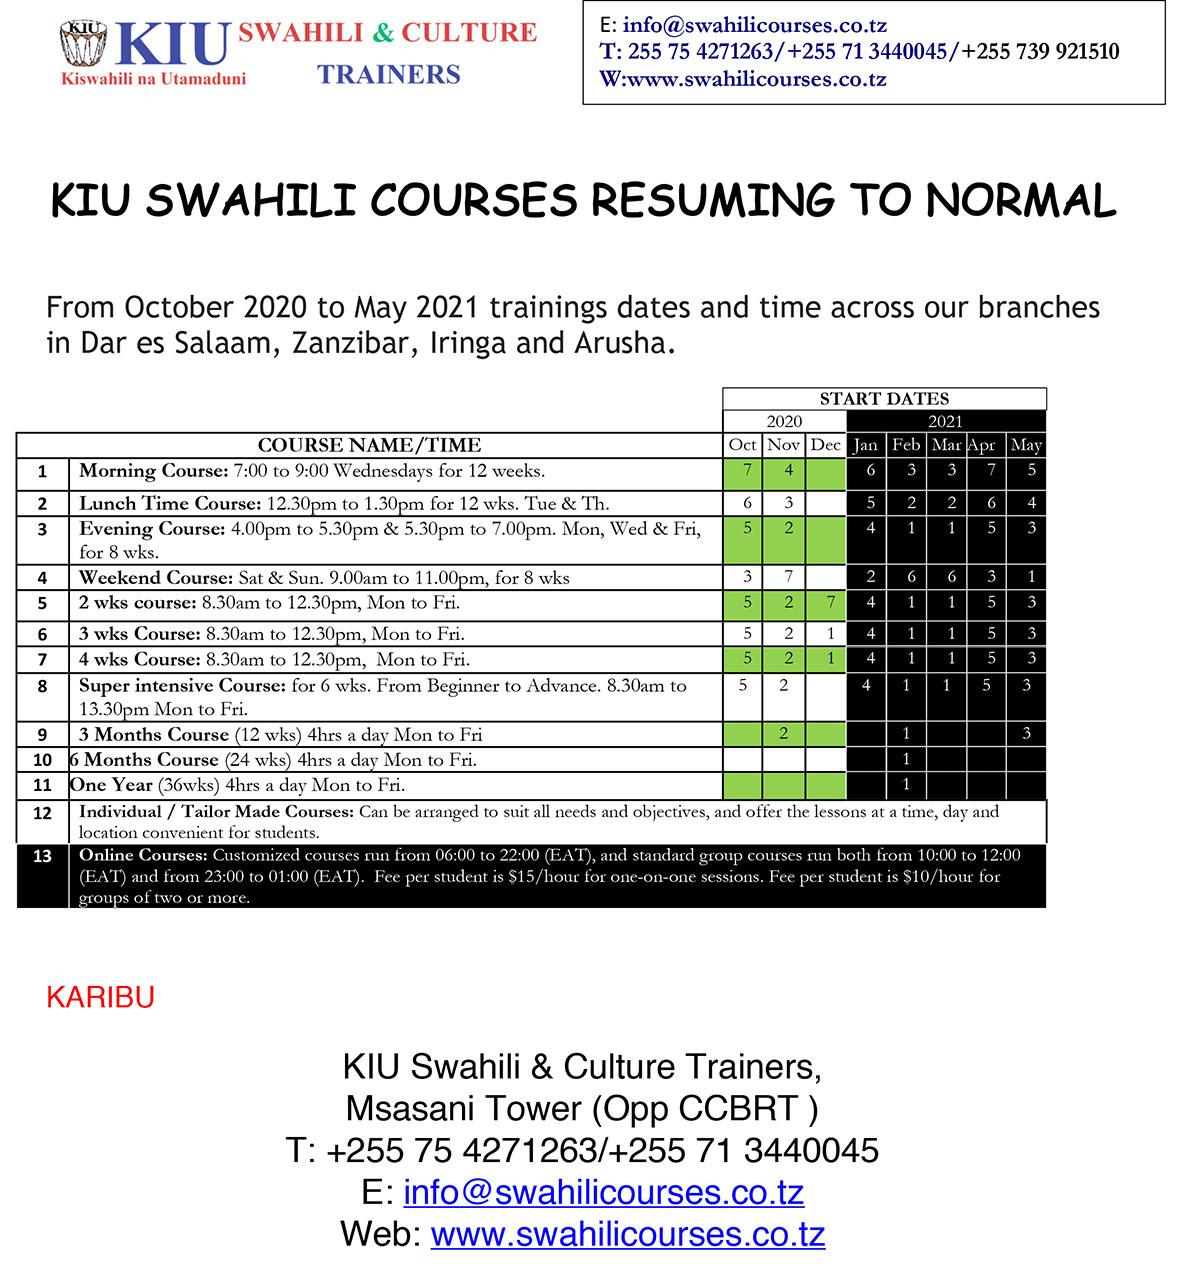 KIU Swahili & Cultural Trainers Courses resume